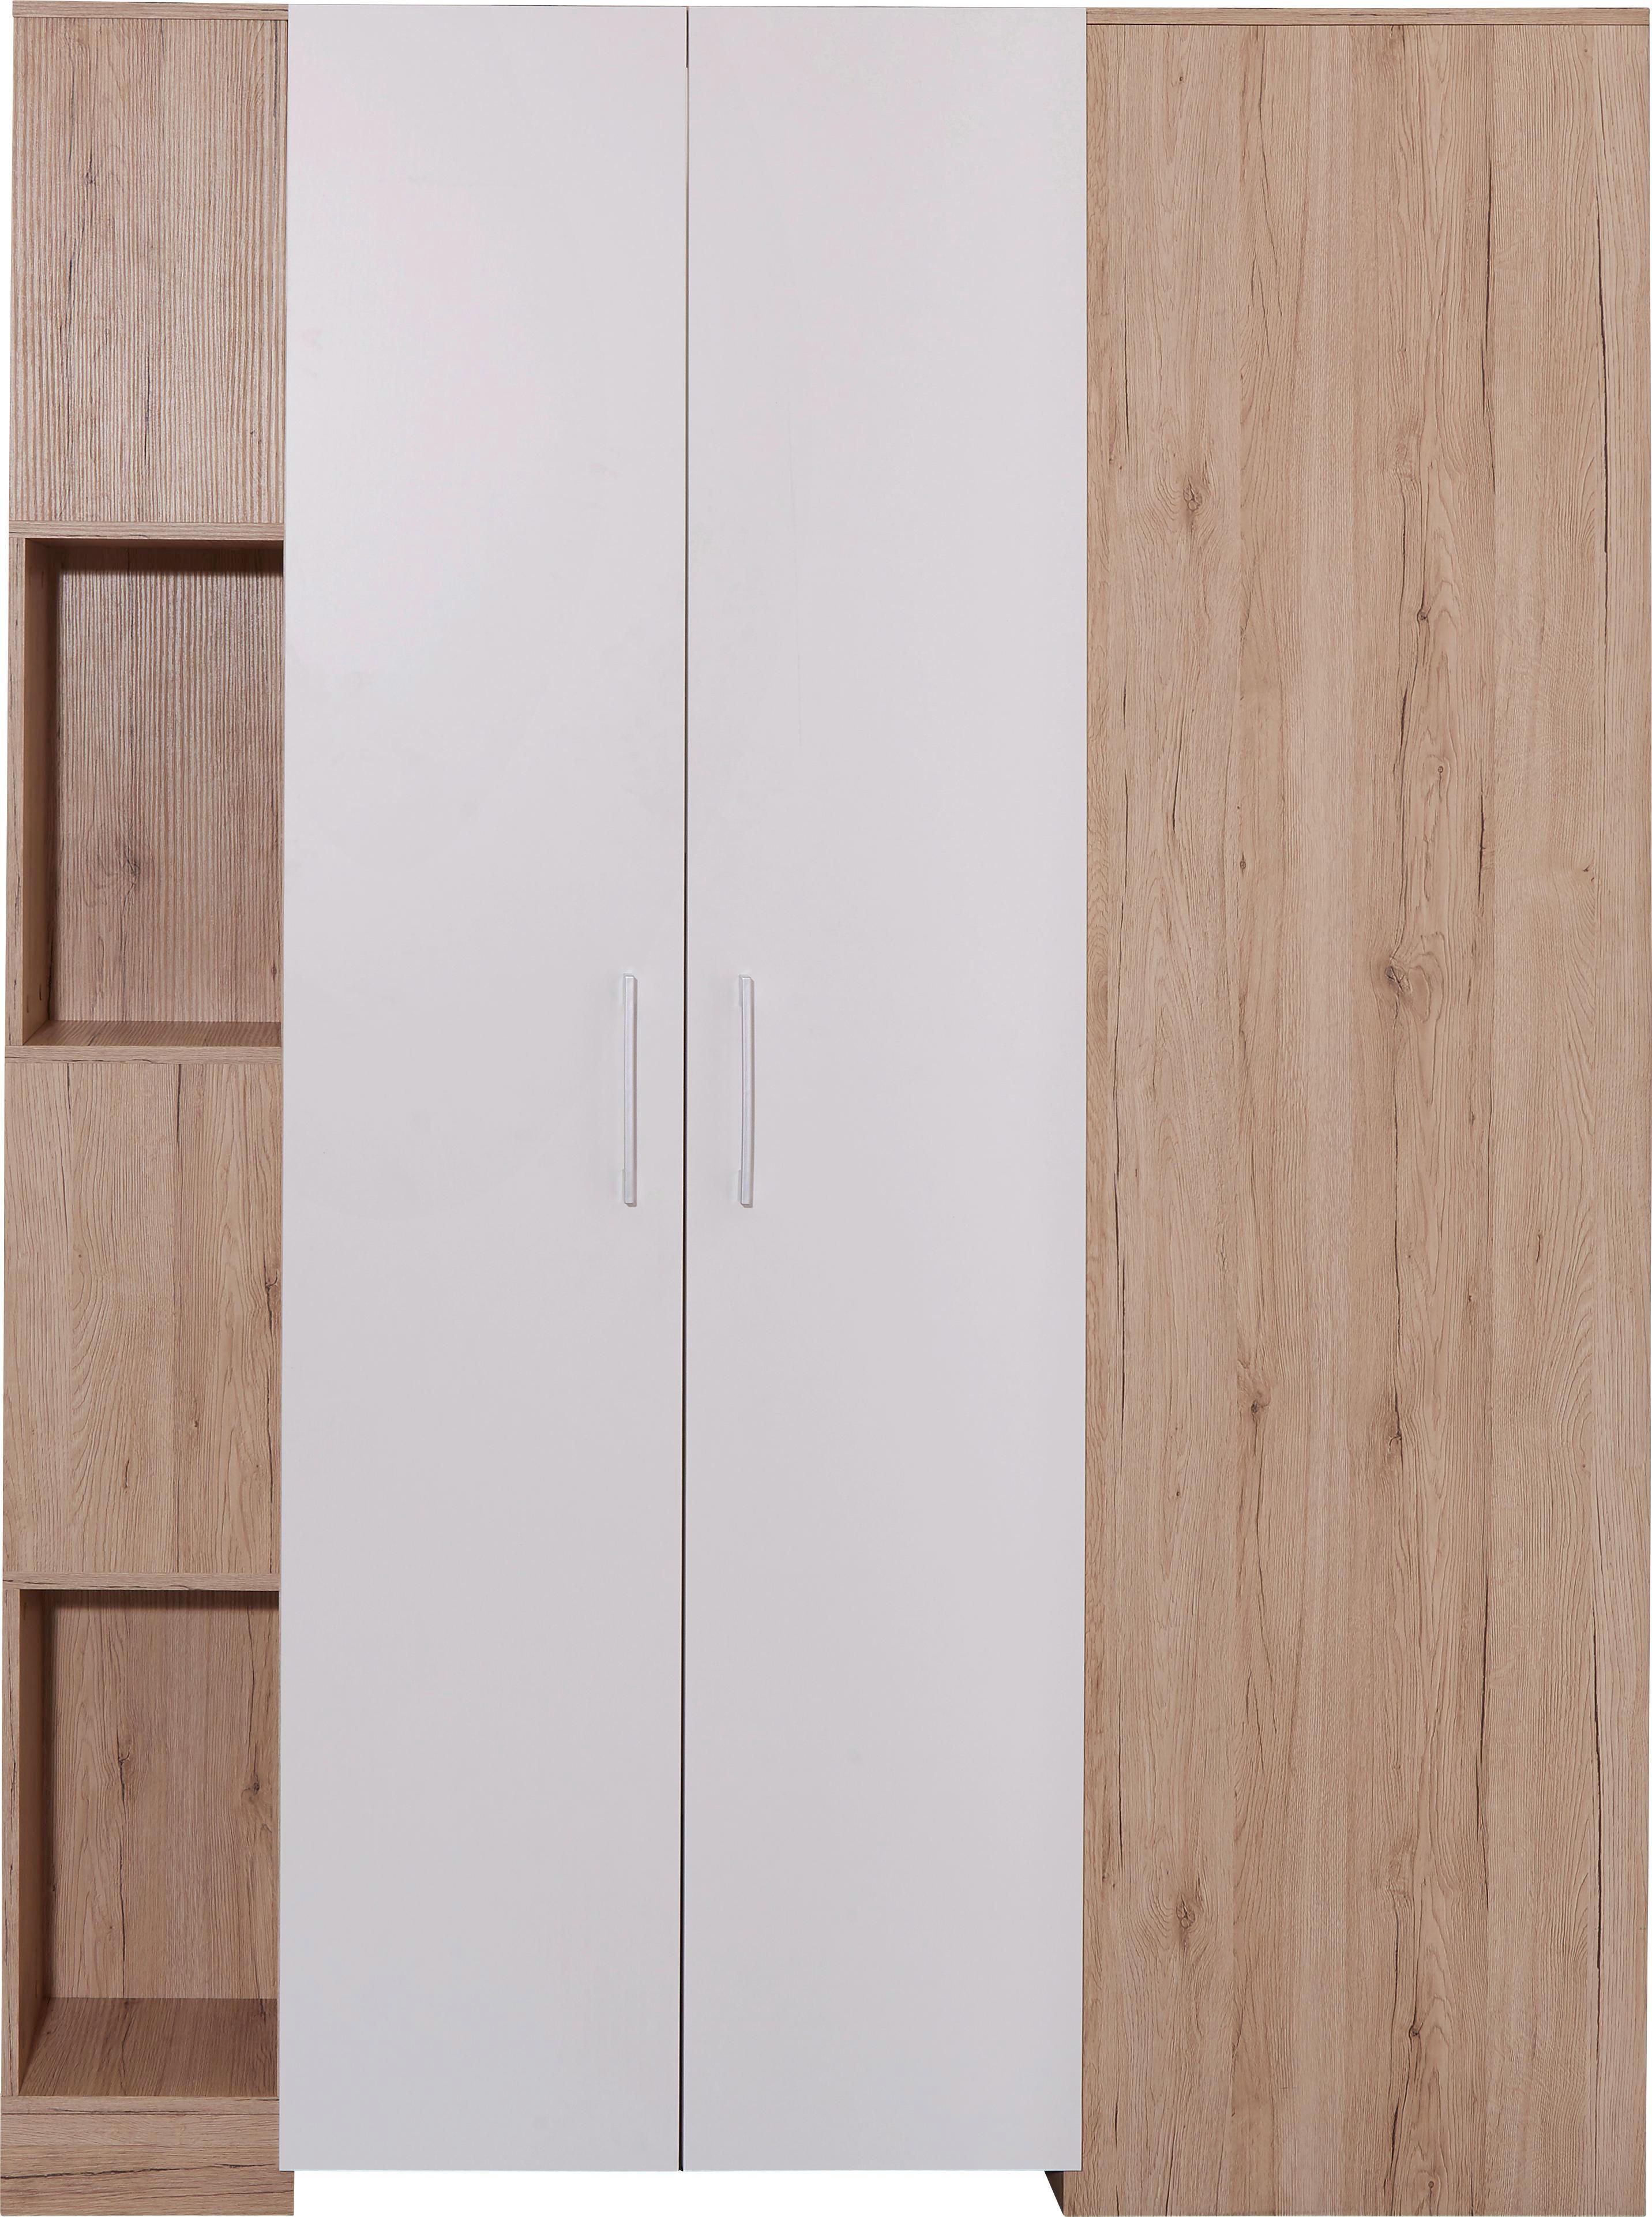 eckkommode buche perfect eckkommode ikea with eckkommode. Black Bedroom Furniture Sets. Home Design Ideas